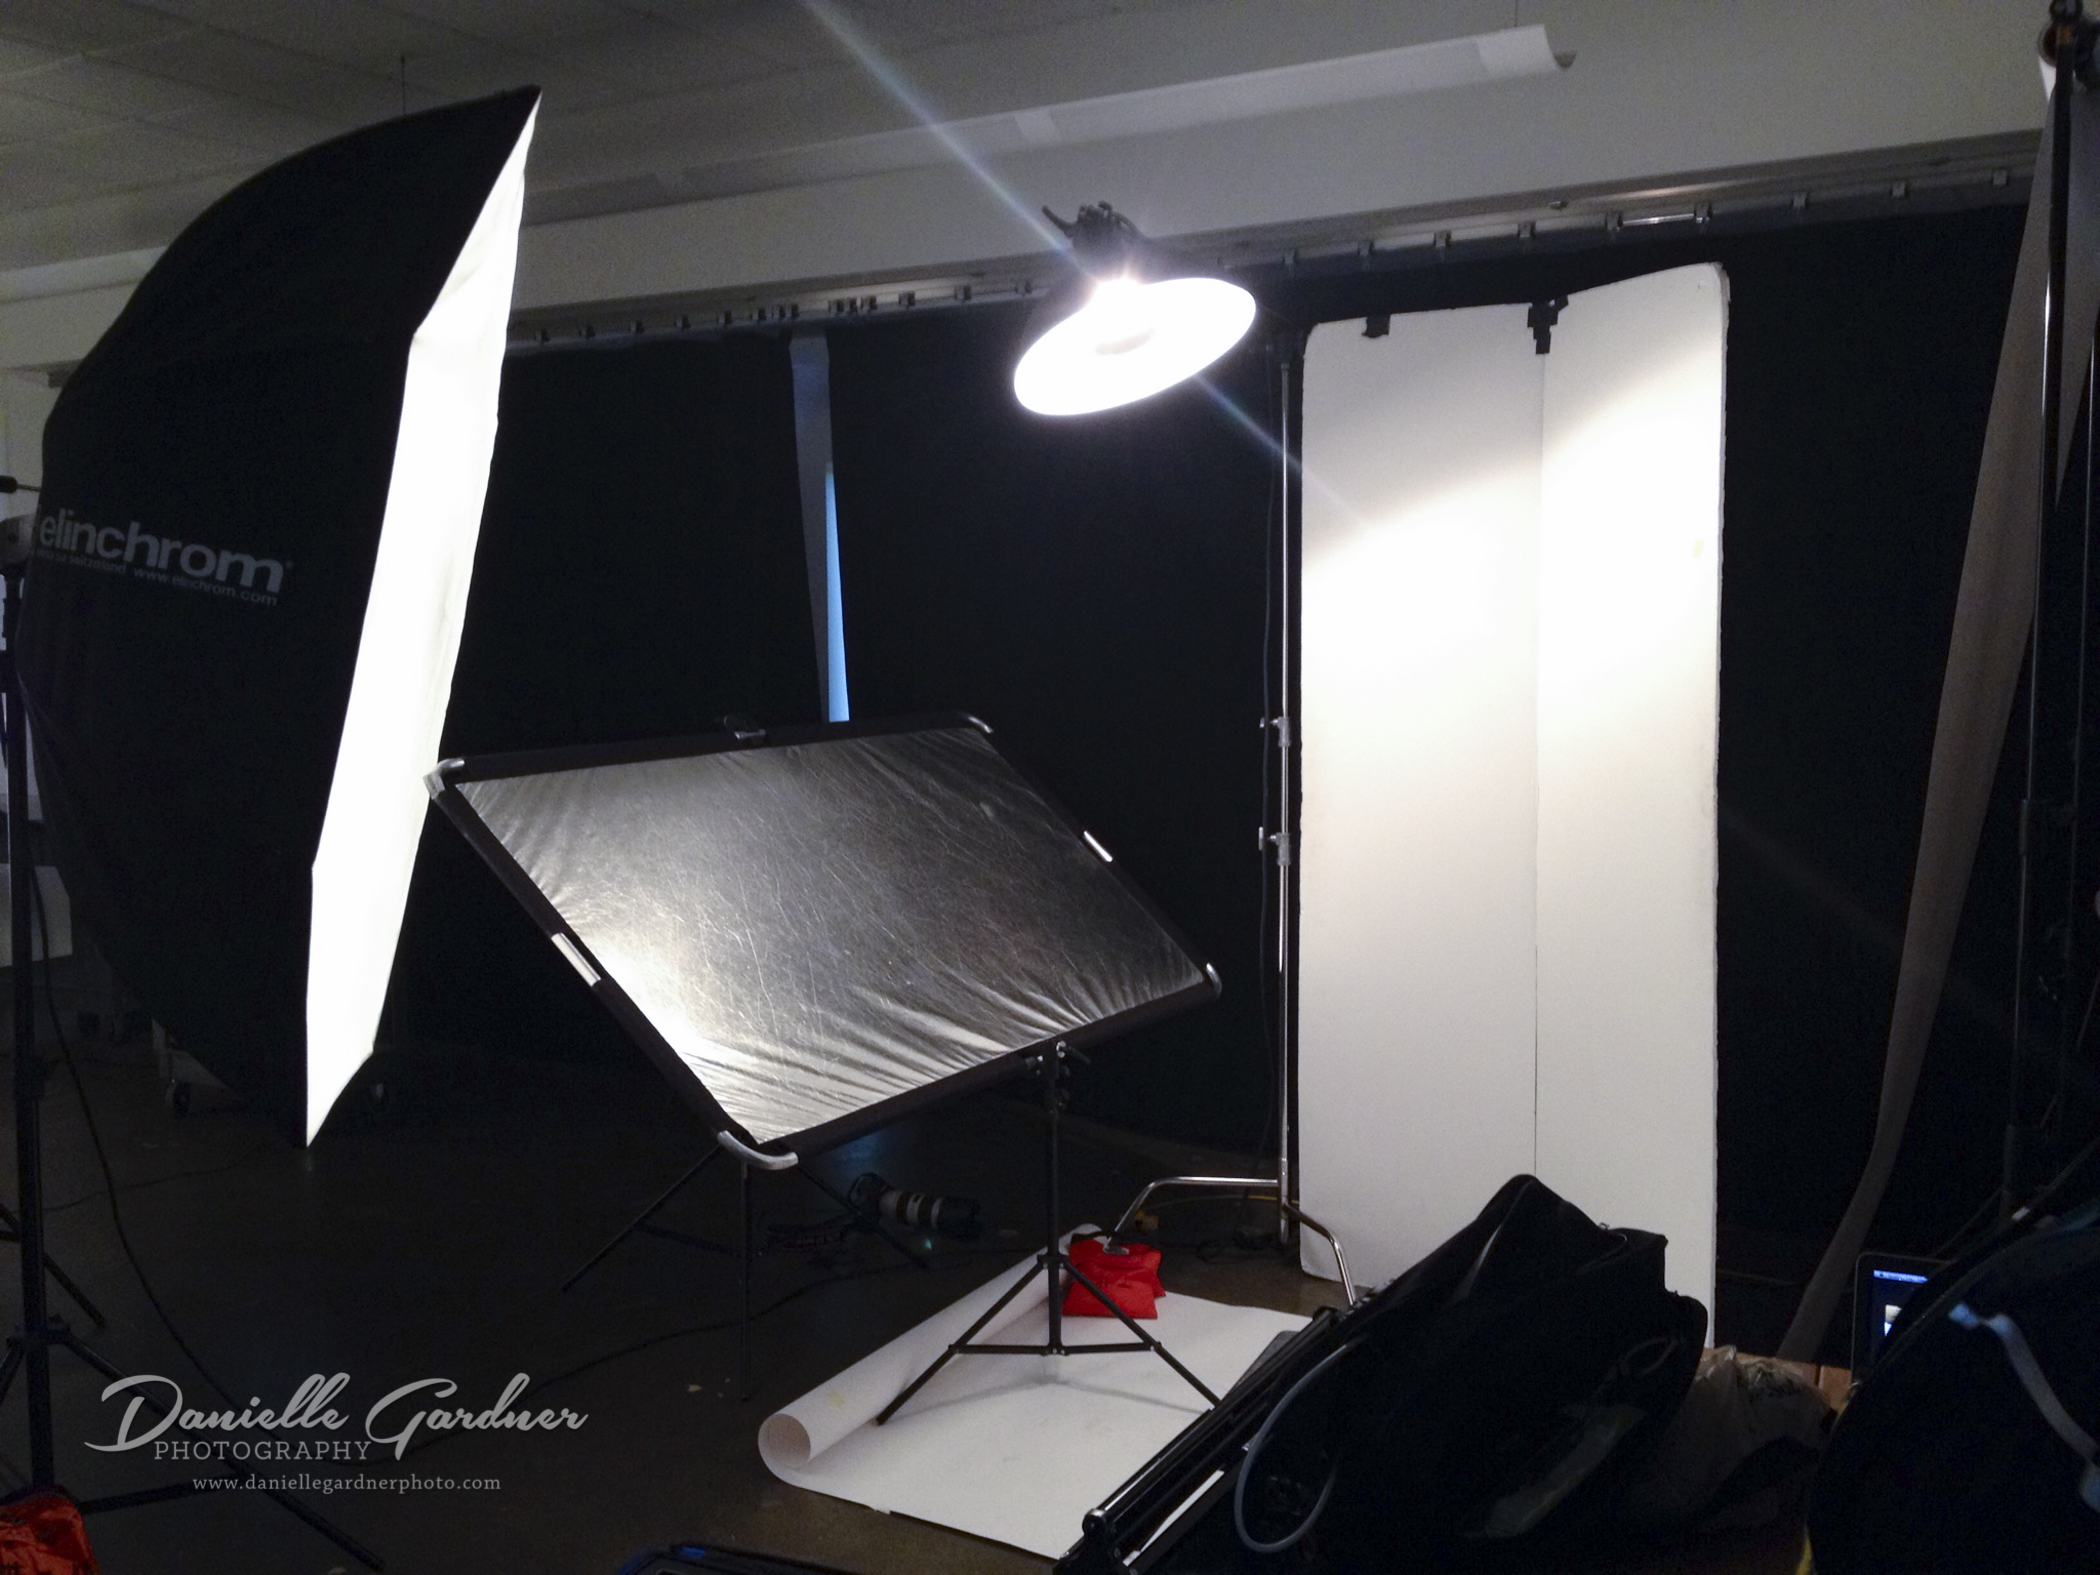 Danielle Gardner_Blog_Fun With Portraits_BTS-2.jpg